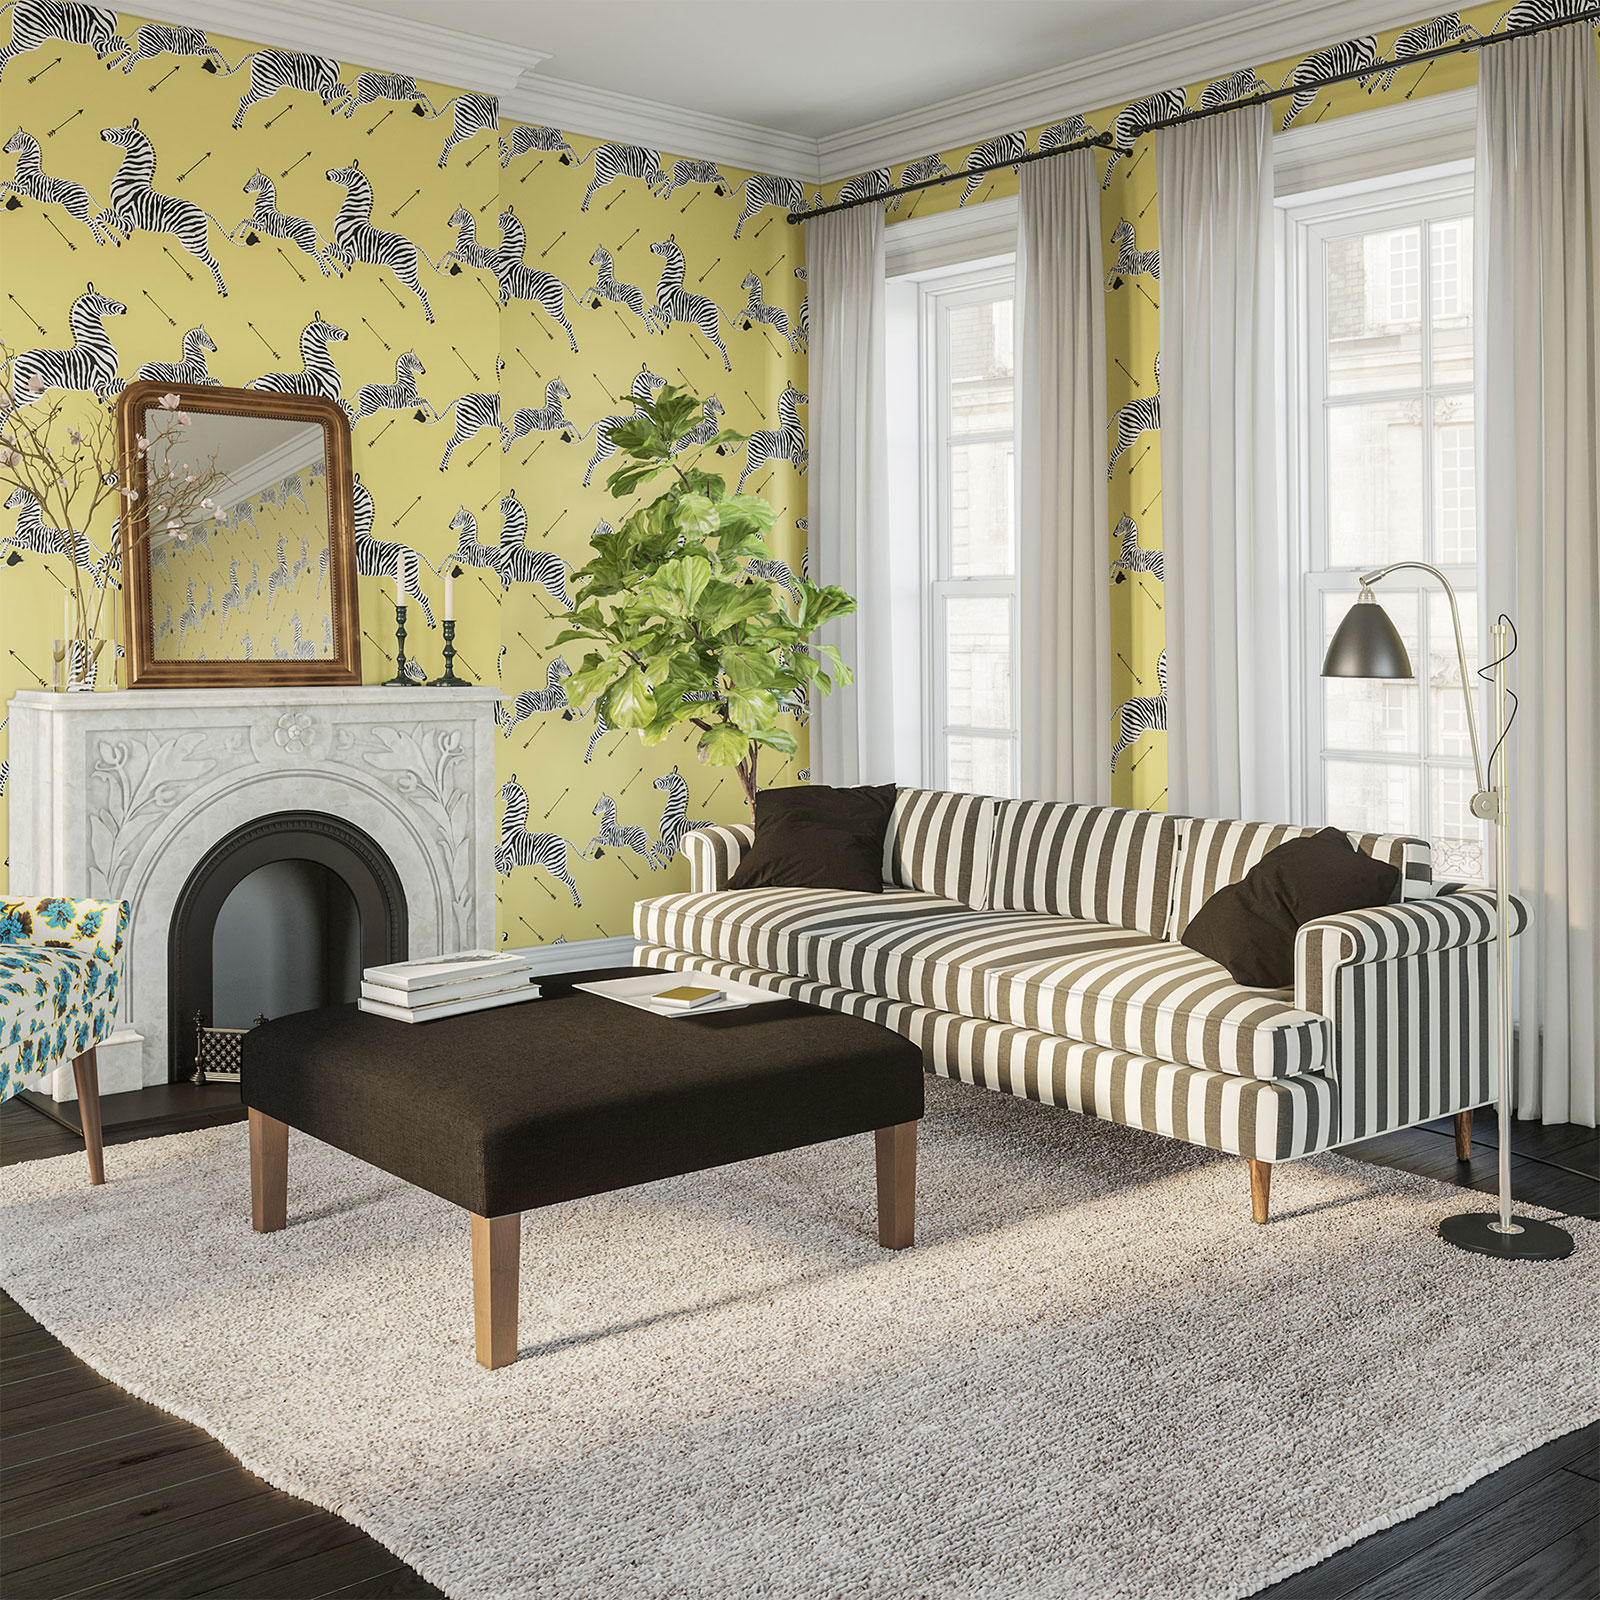 Pale yellow zebra wallpaper by Scalamandre (c)